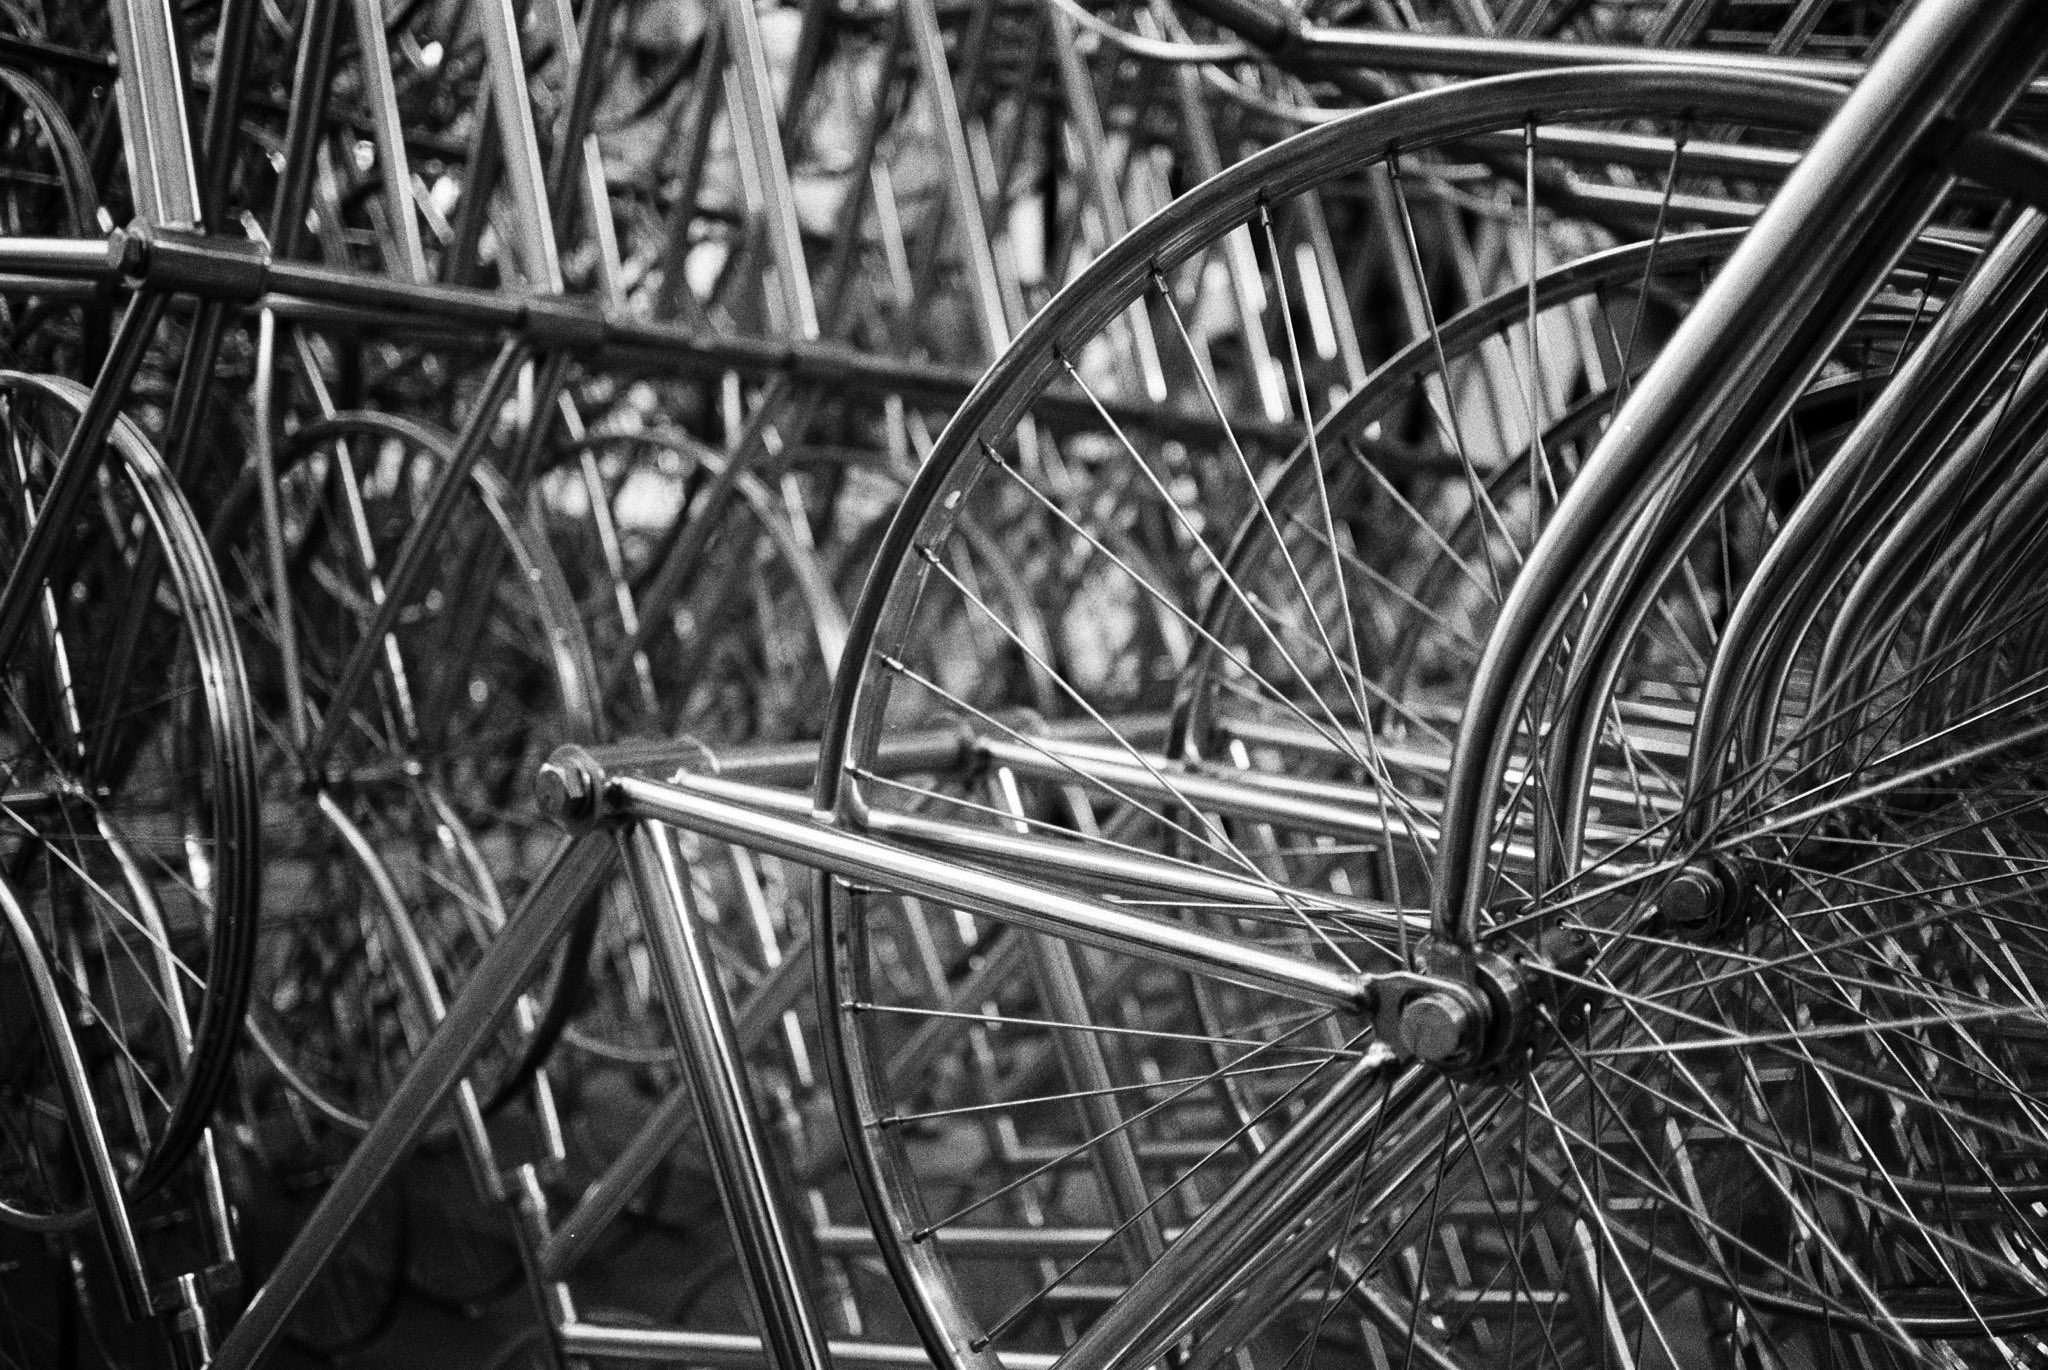 @Givemeabiscuit Wheels. Olympus OM1n. @ILFORDPhoto HP5. #Believeinfilm #35mmhp5 #FridayFavourites